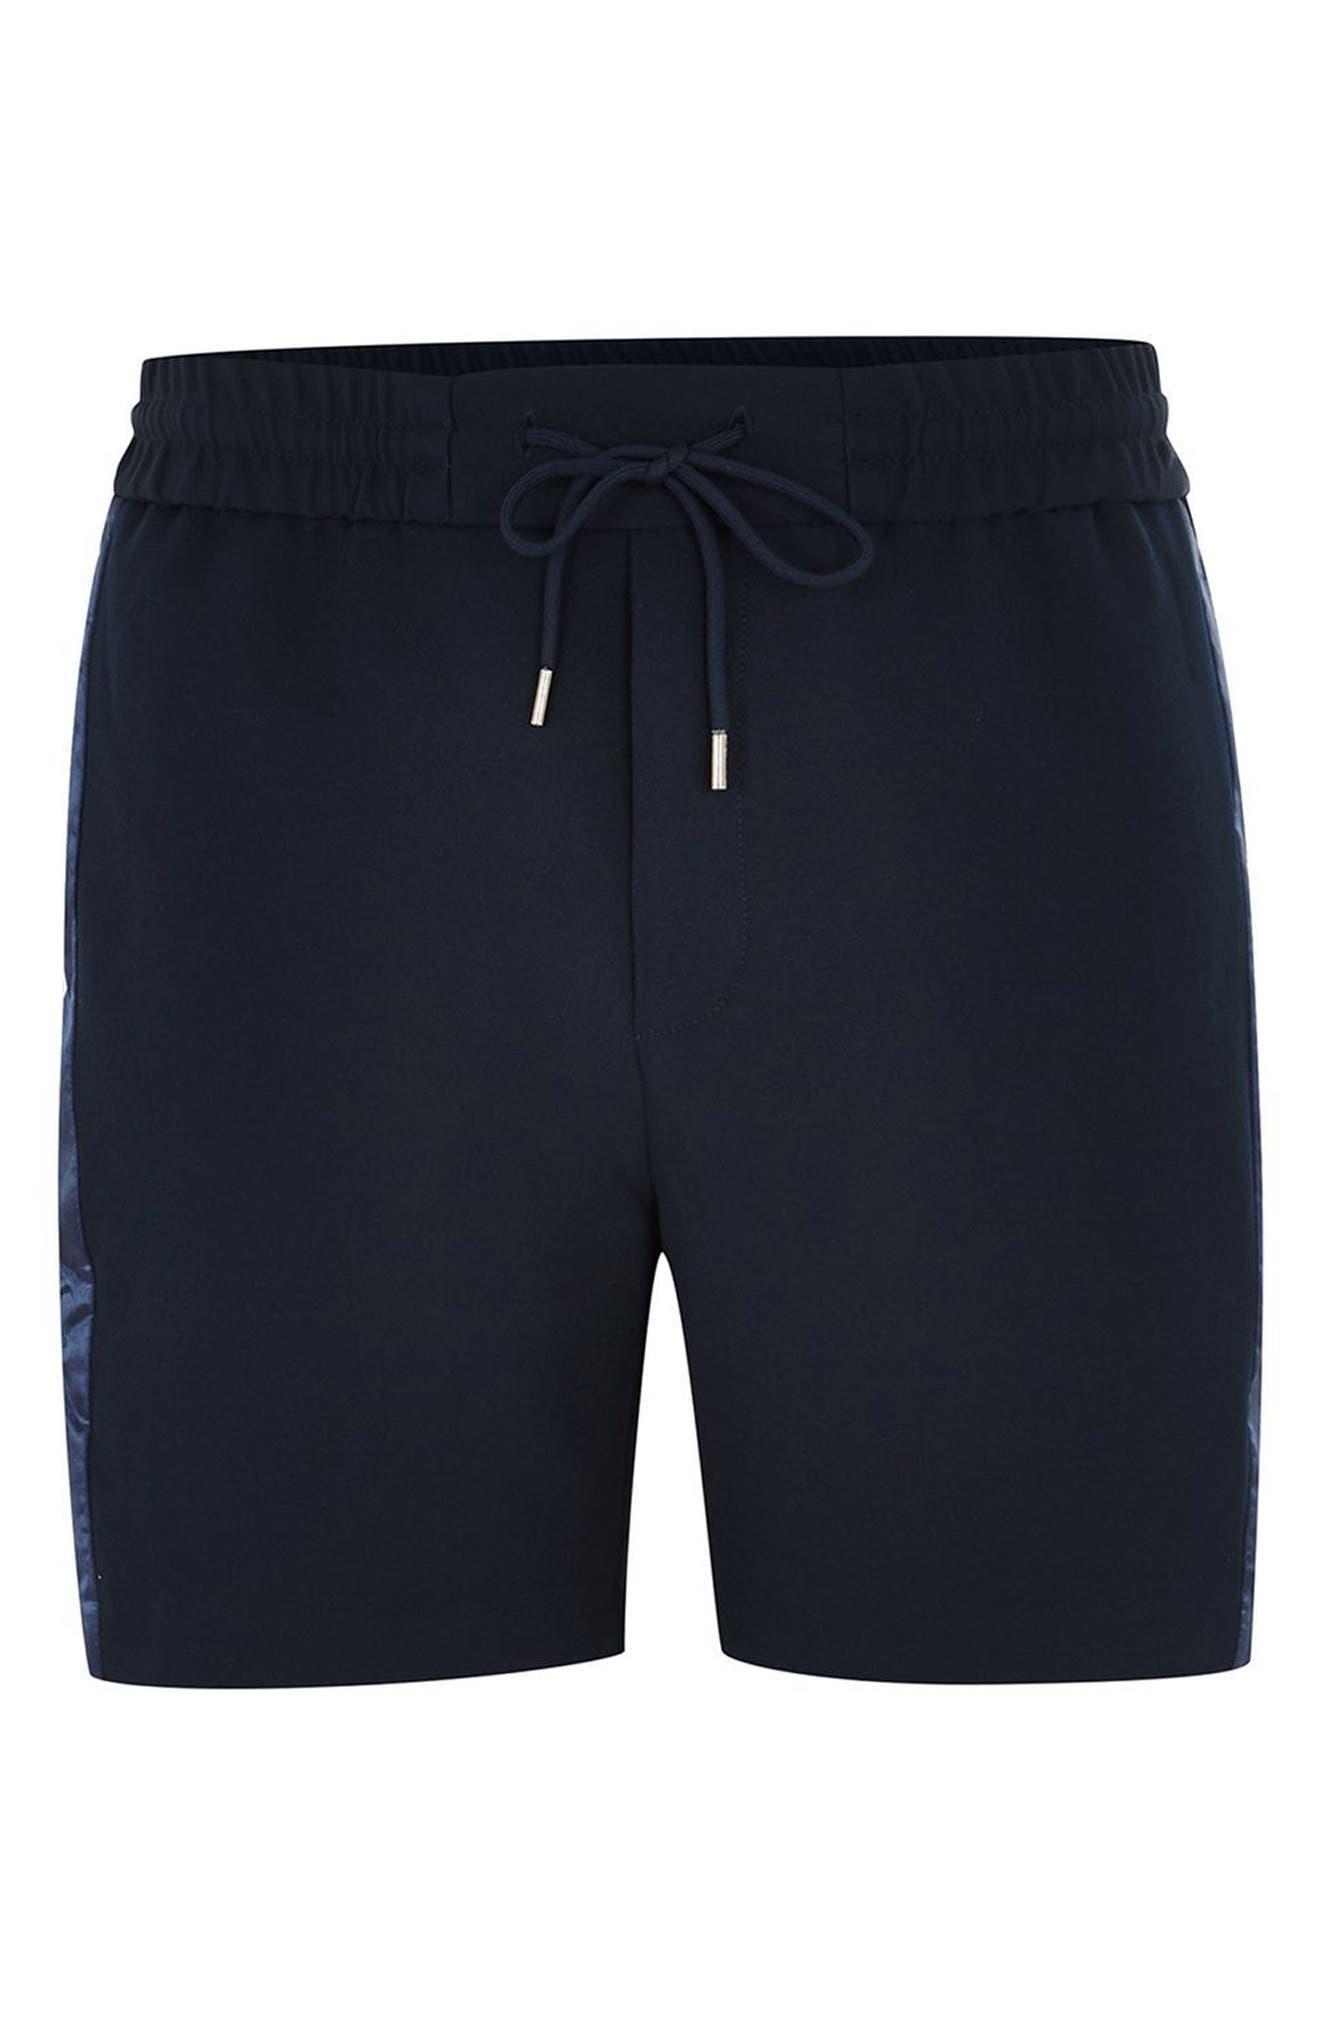 Satin Trim Shorts,                             Alternate thumbnail 4, color,                             NAVY BLUE